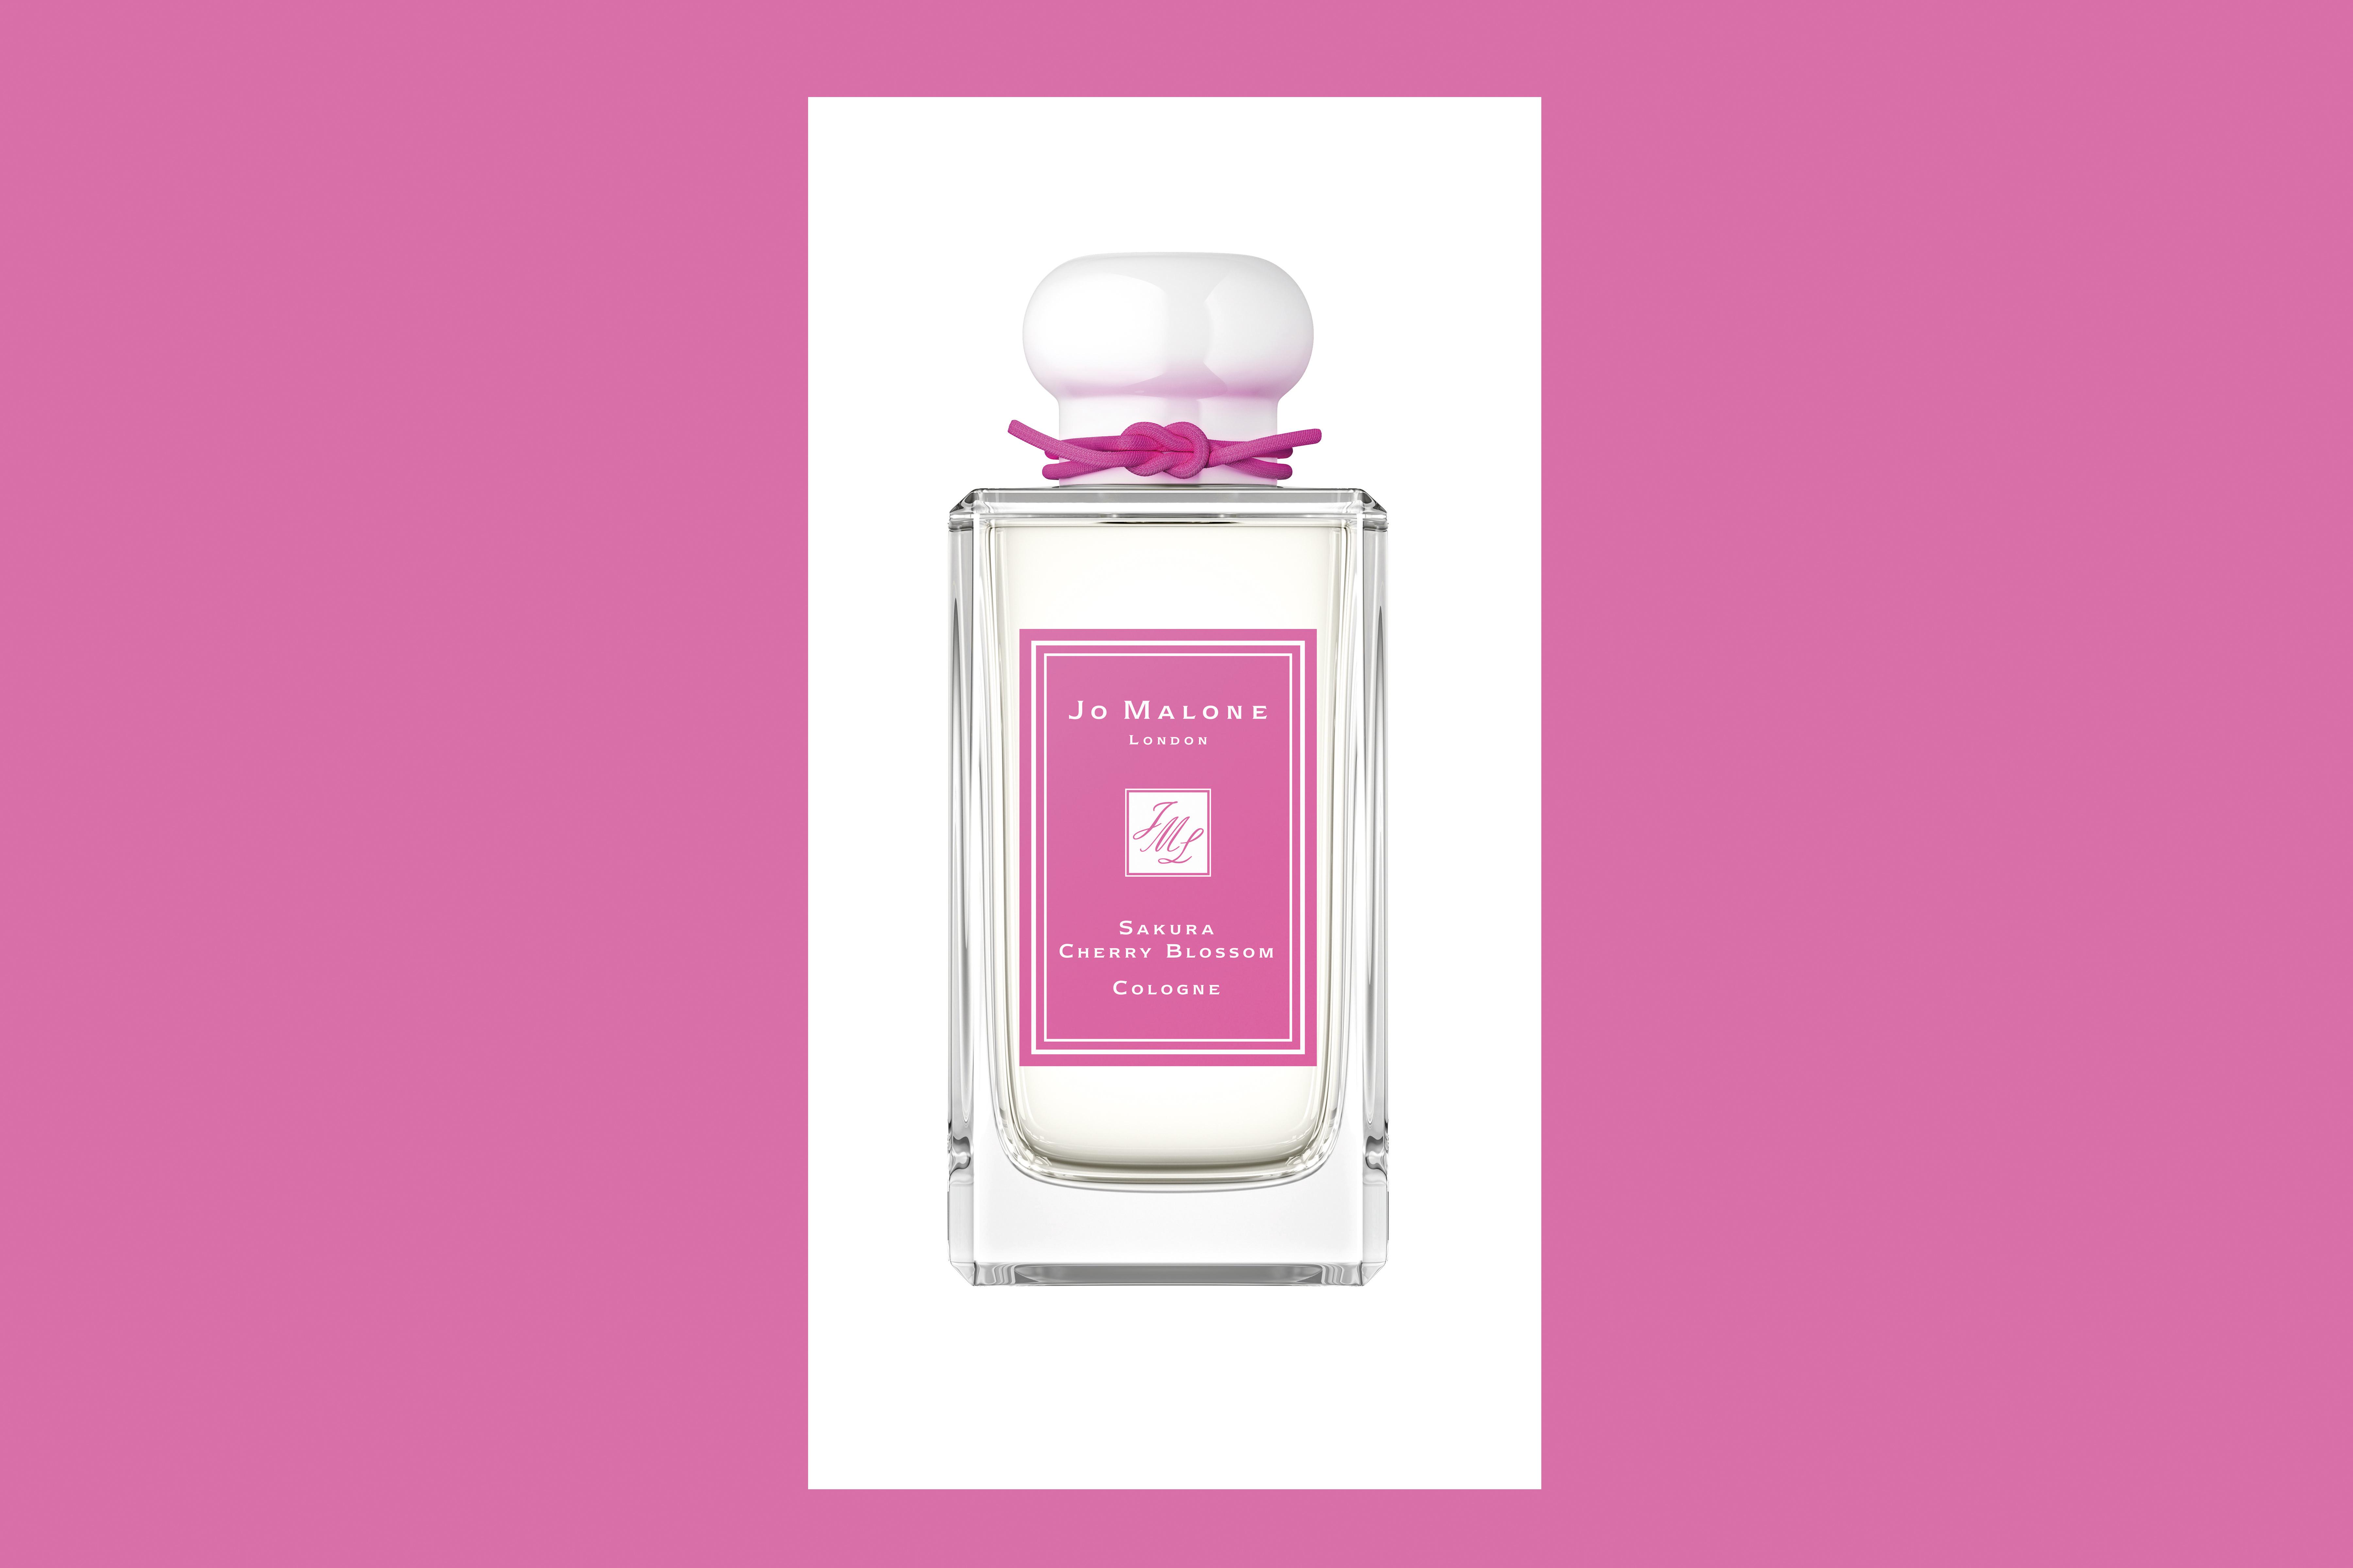 Jo Malone London 推出了限量版花香 Blossom Girls 花漾女孩系列 粉色的包裝是要擄走你的心